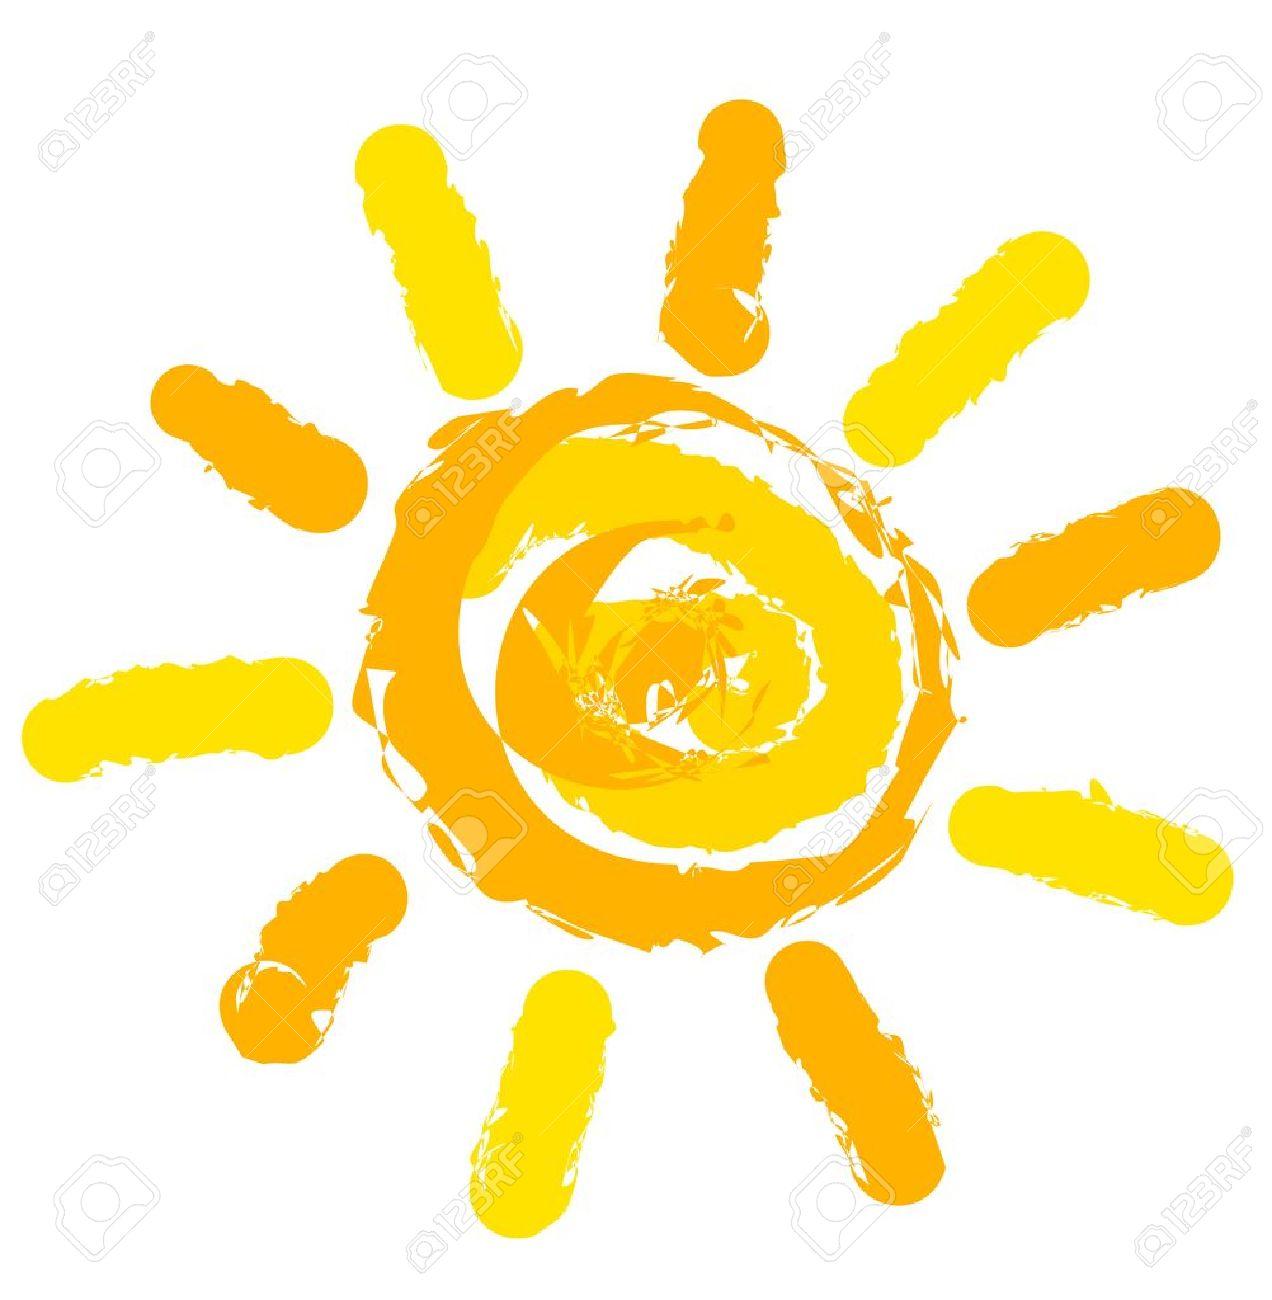 sun symbol illustration royalty free cliparts vectors and stock rh 123rf com